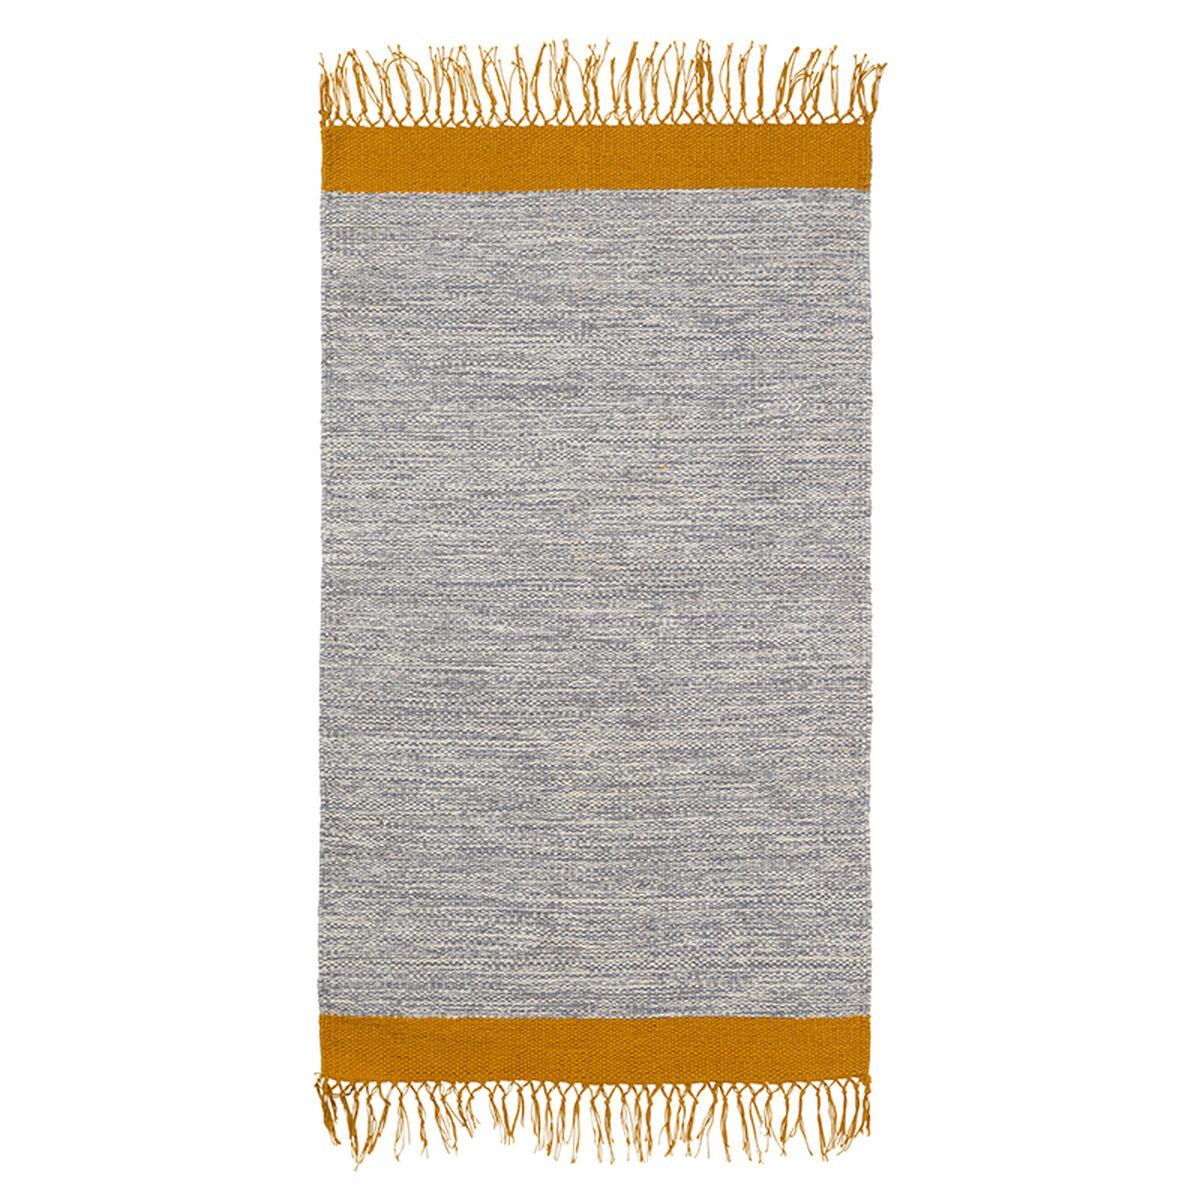 Ferm Living Melange kylpyhuoneen matto, harmaa